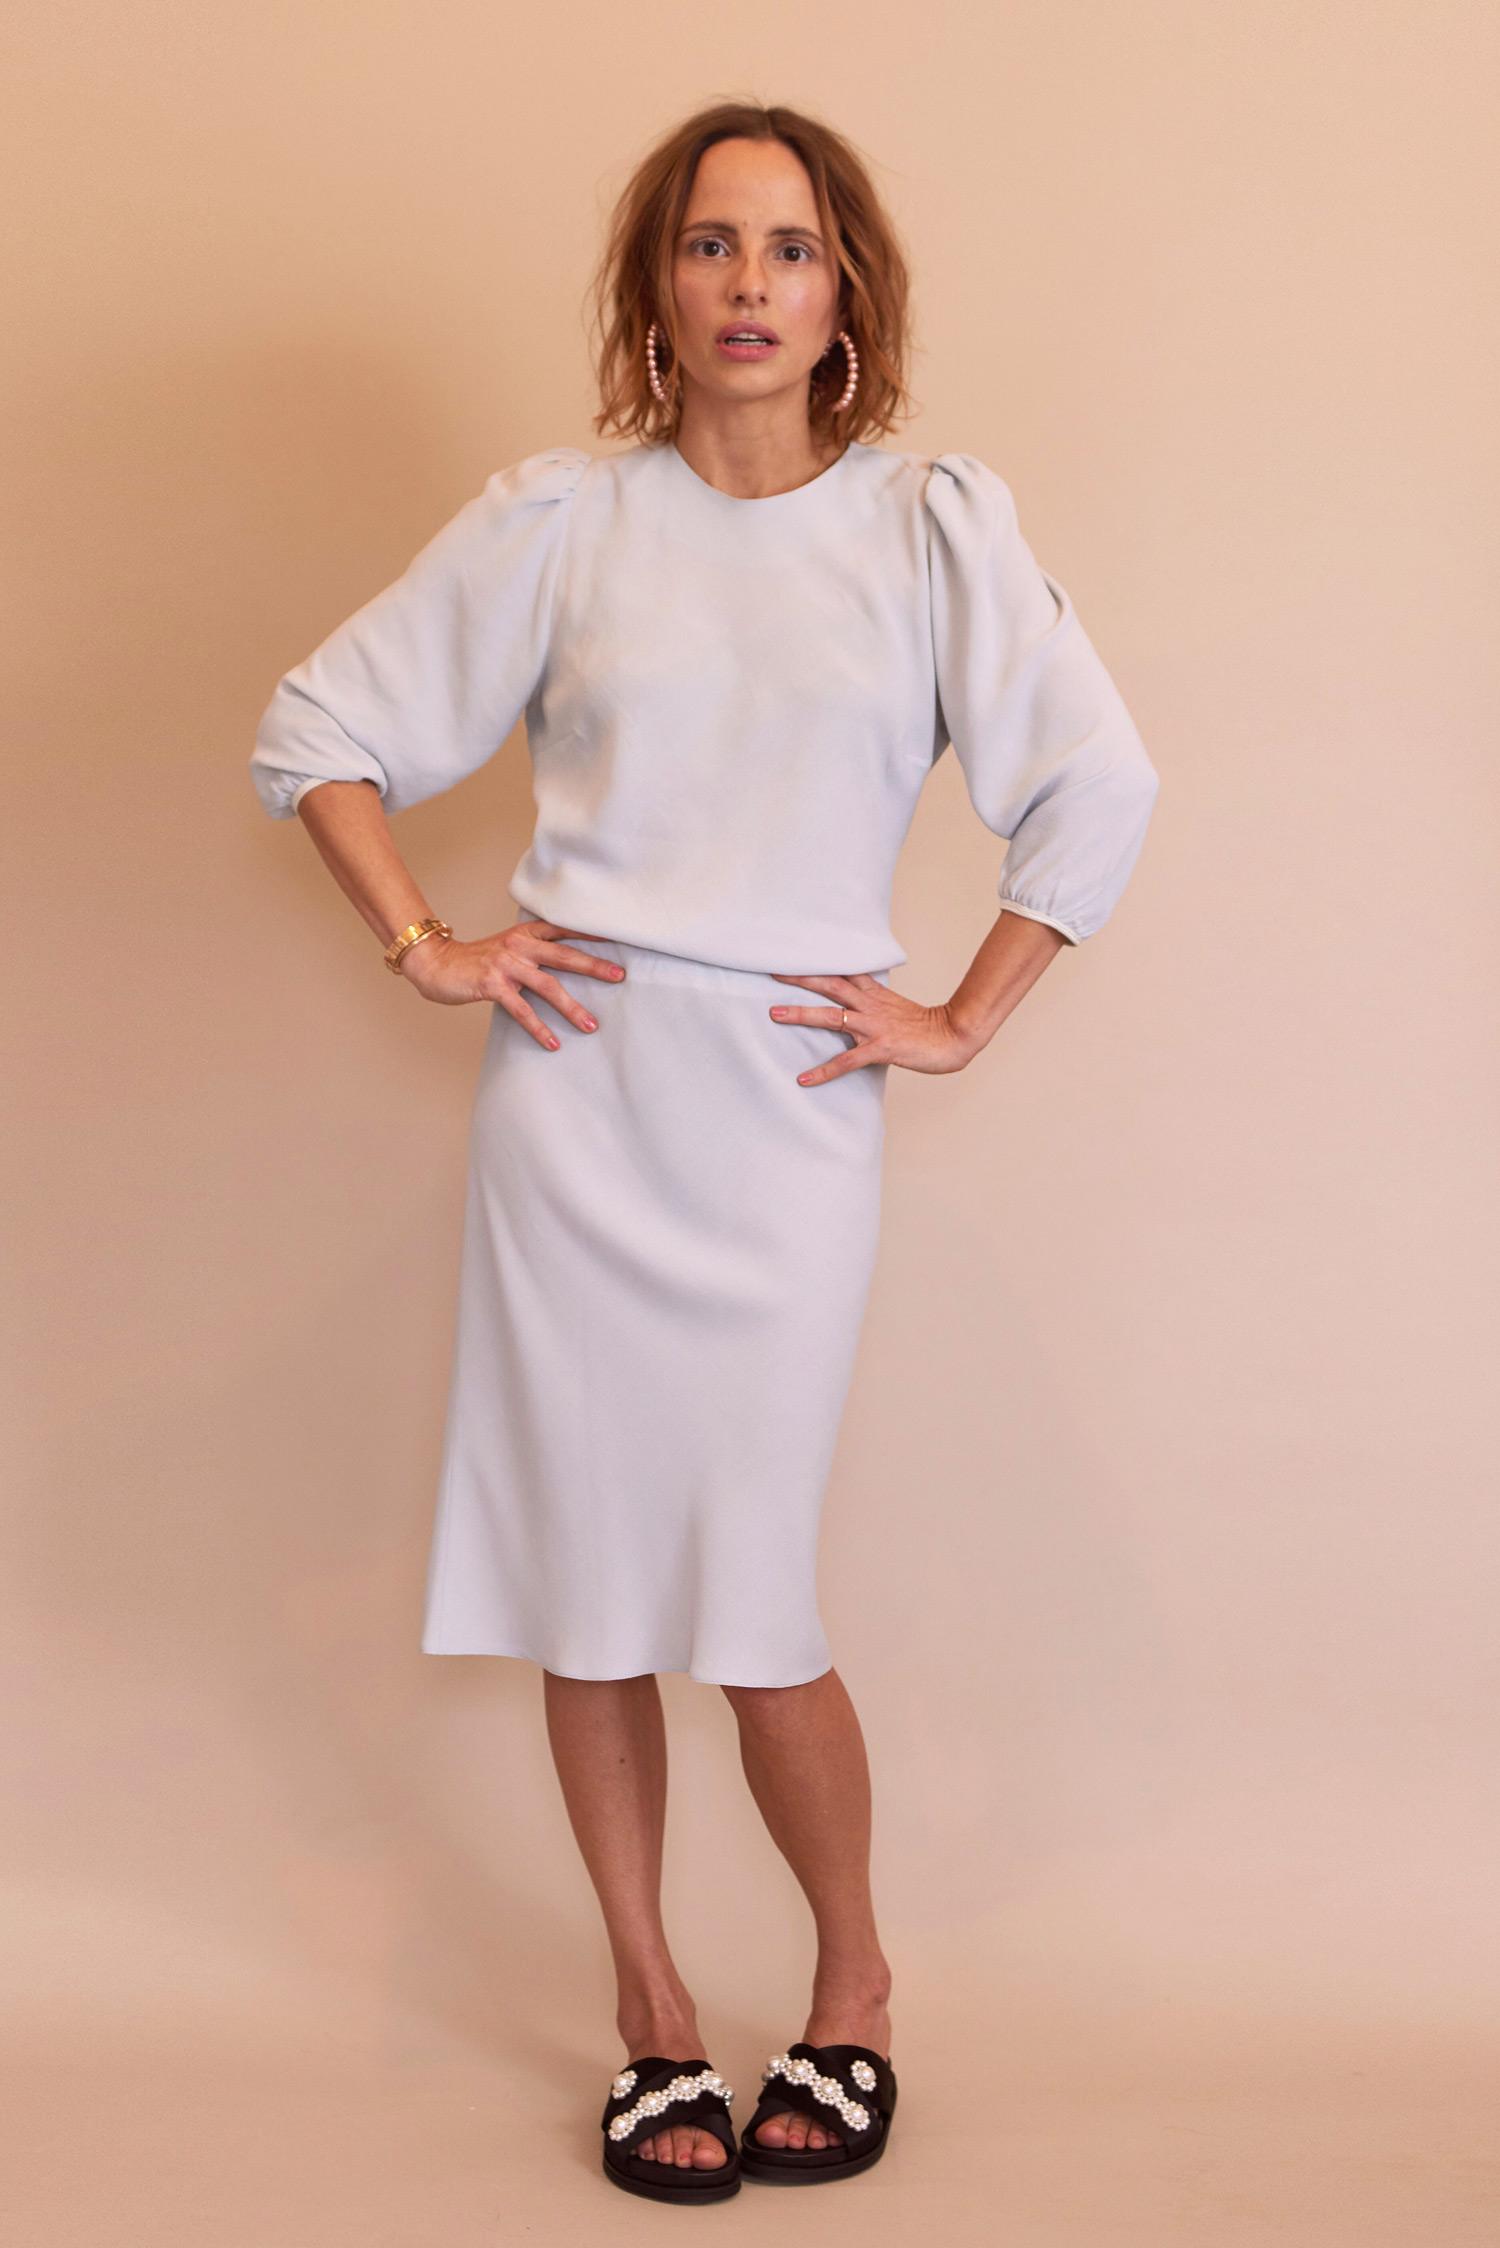 Rosa Macher Bias Top 001 and Bias Skirt 001 in Mist